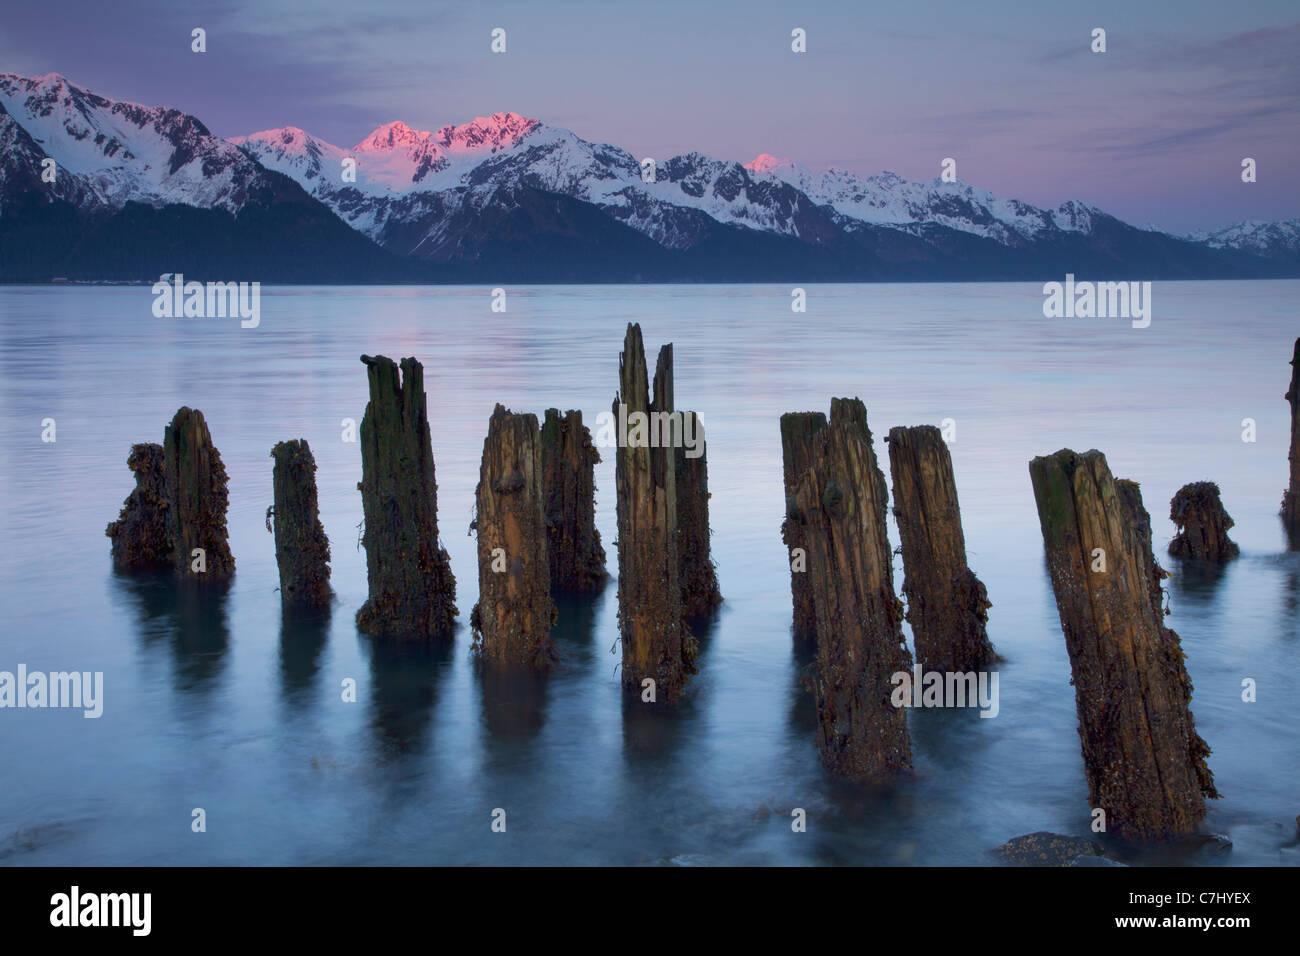 Resurrection Bay, Seward, Alaska. - Stock Image